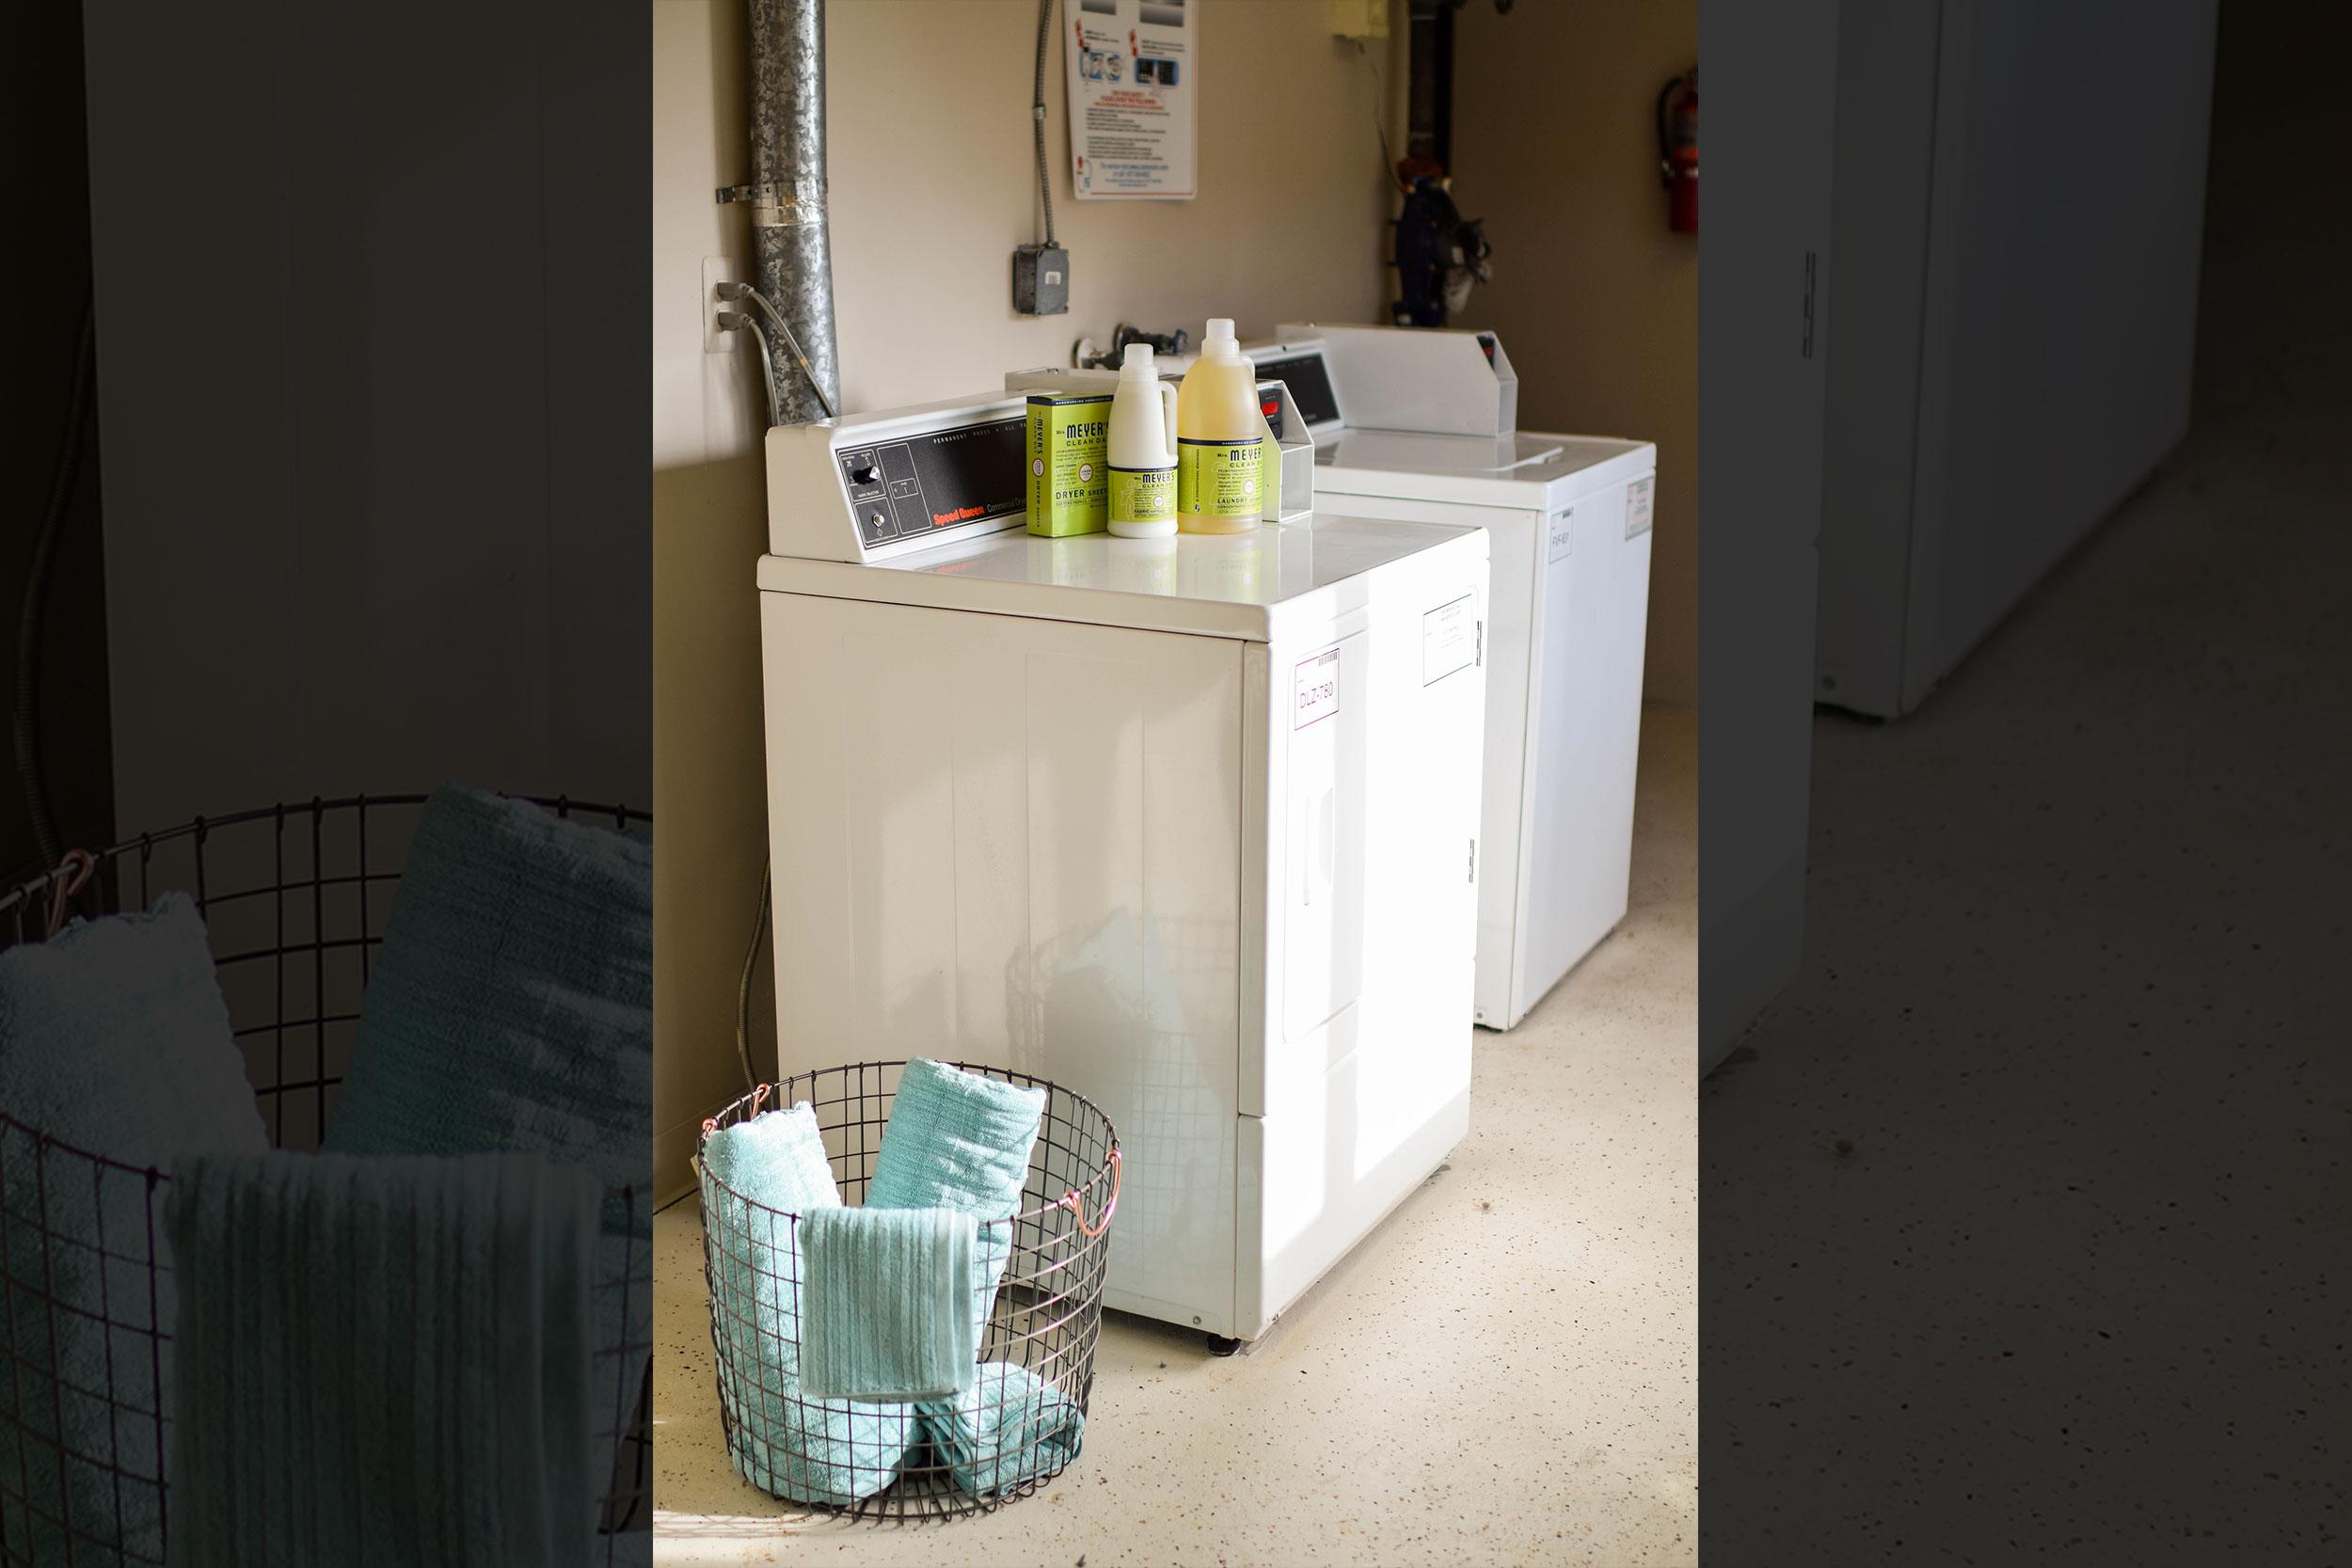 Gsl-amen-laundry